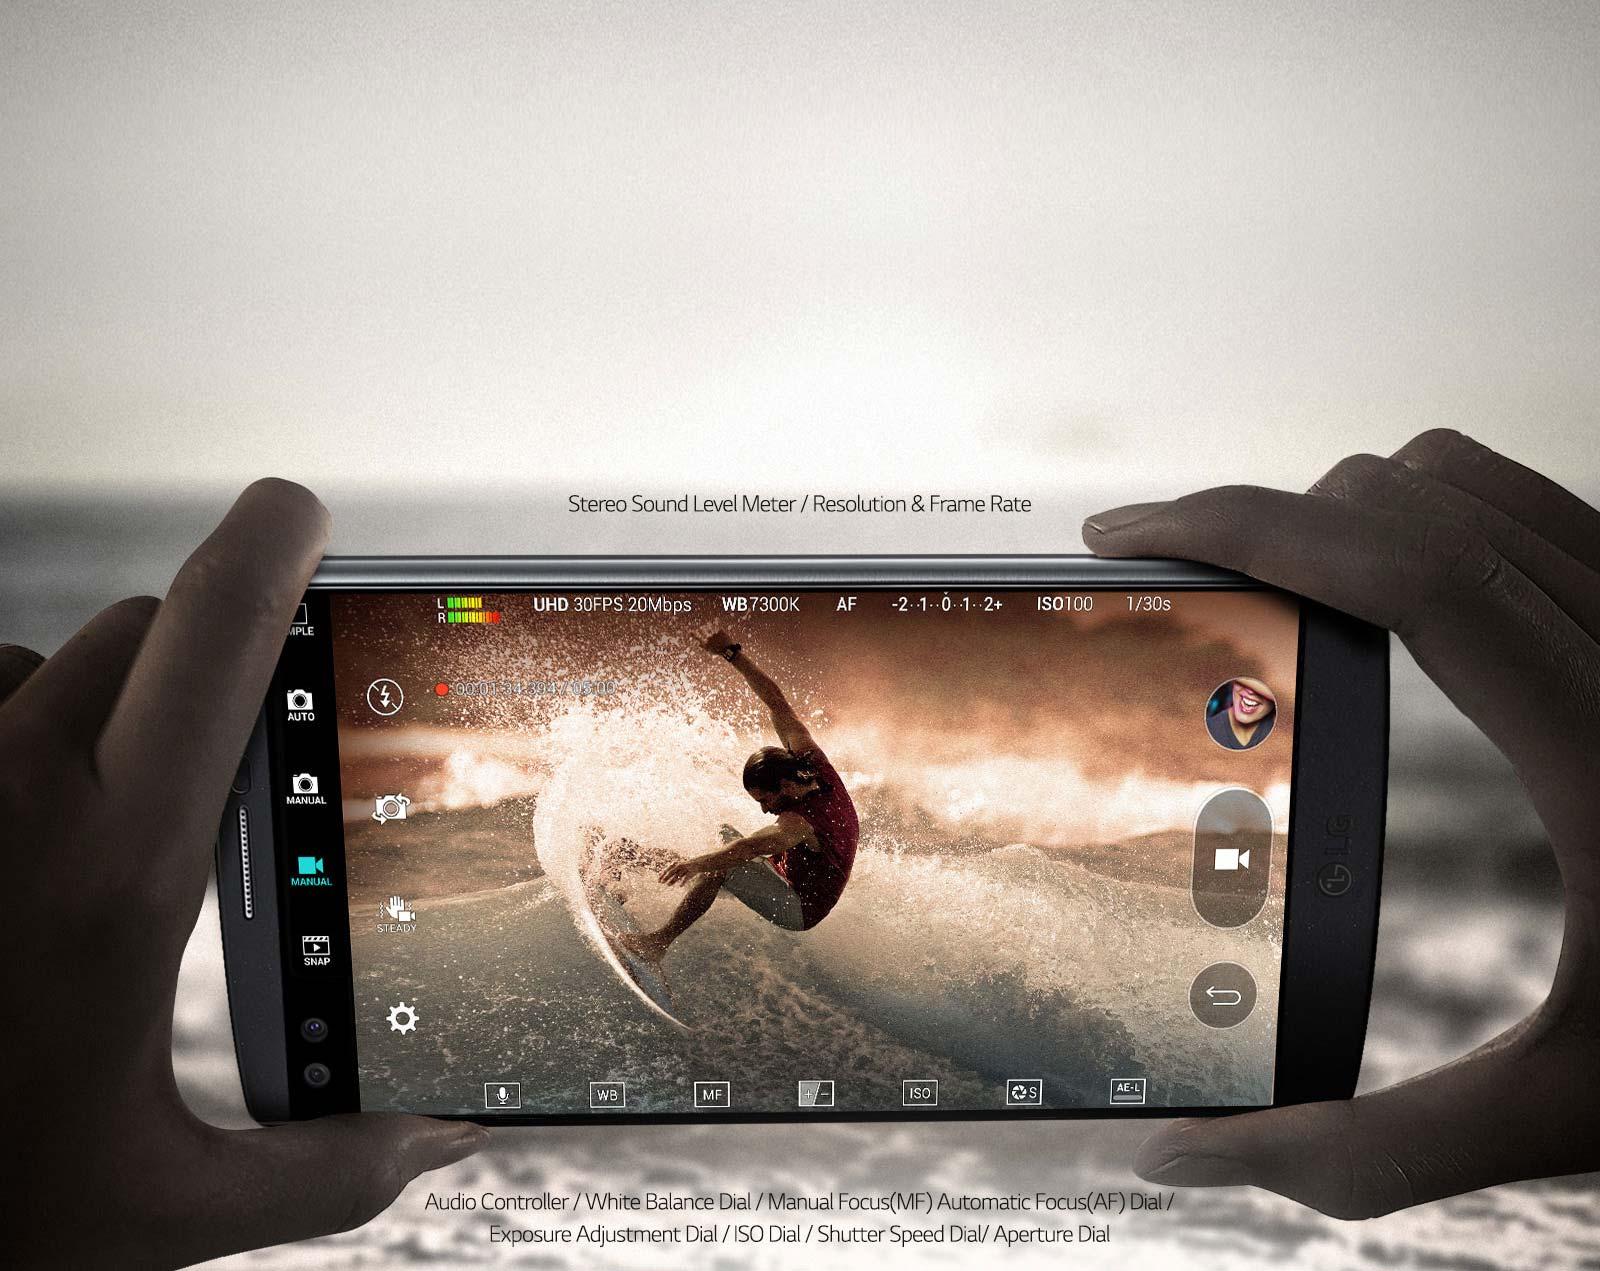 Manual Video Mode